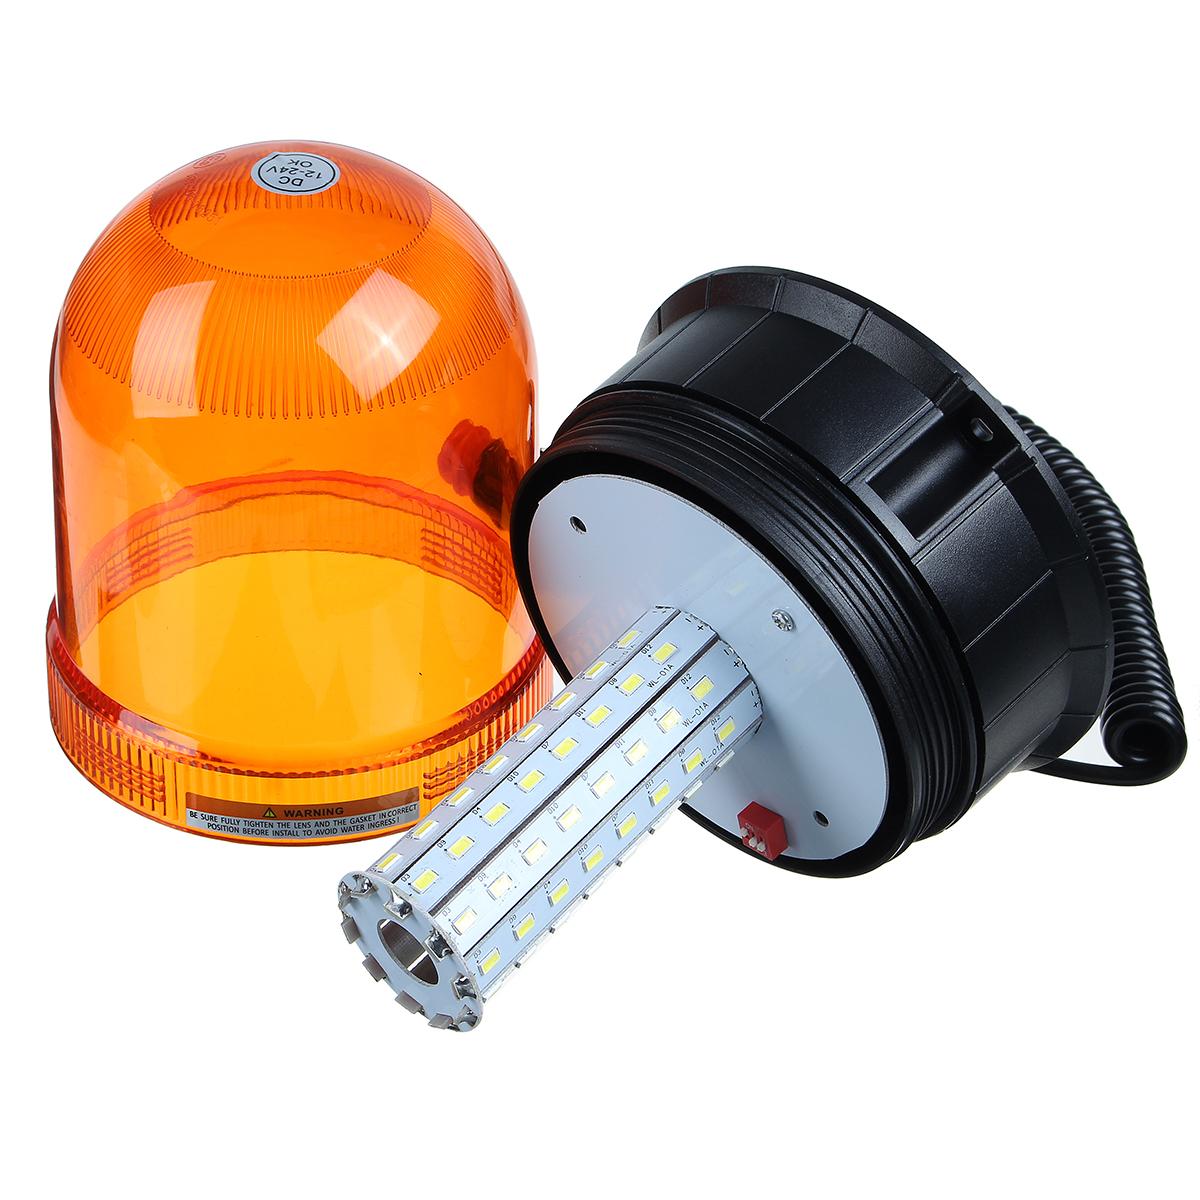 DC12-24V 80LEDs Magnetic Roof Rotating Flash Amber Beacon Strobe Tractor Warning Signal Light